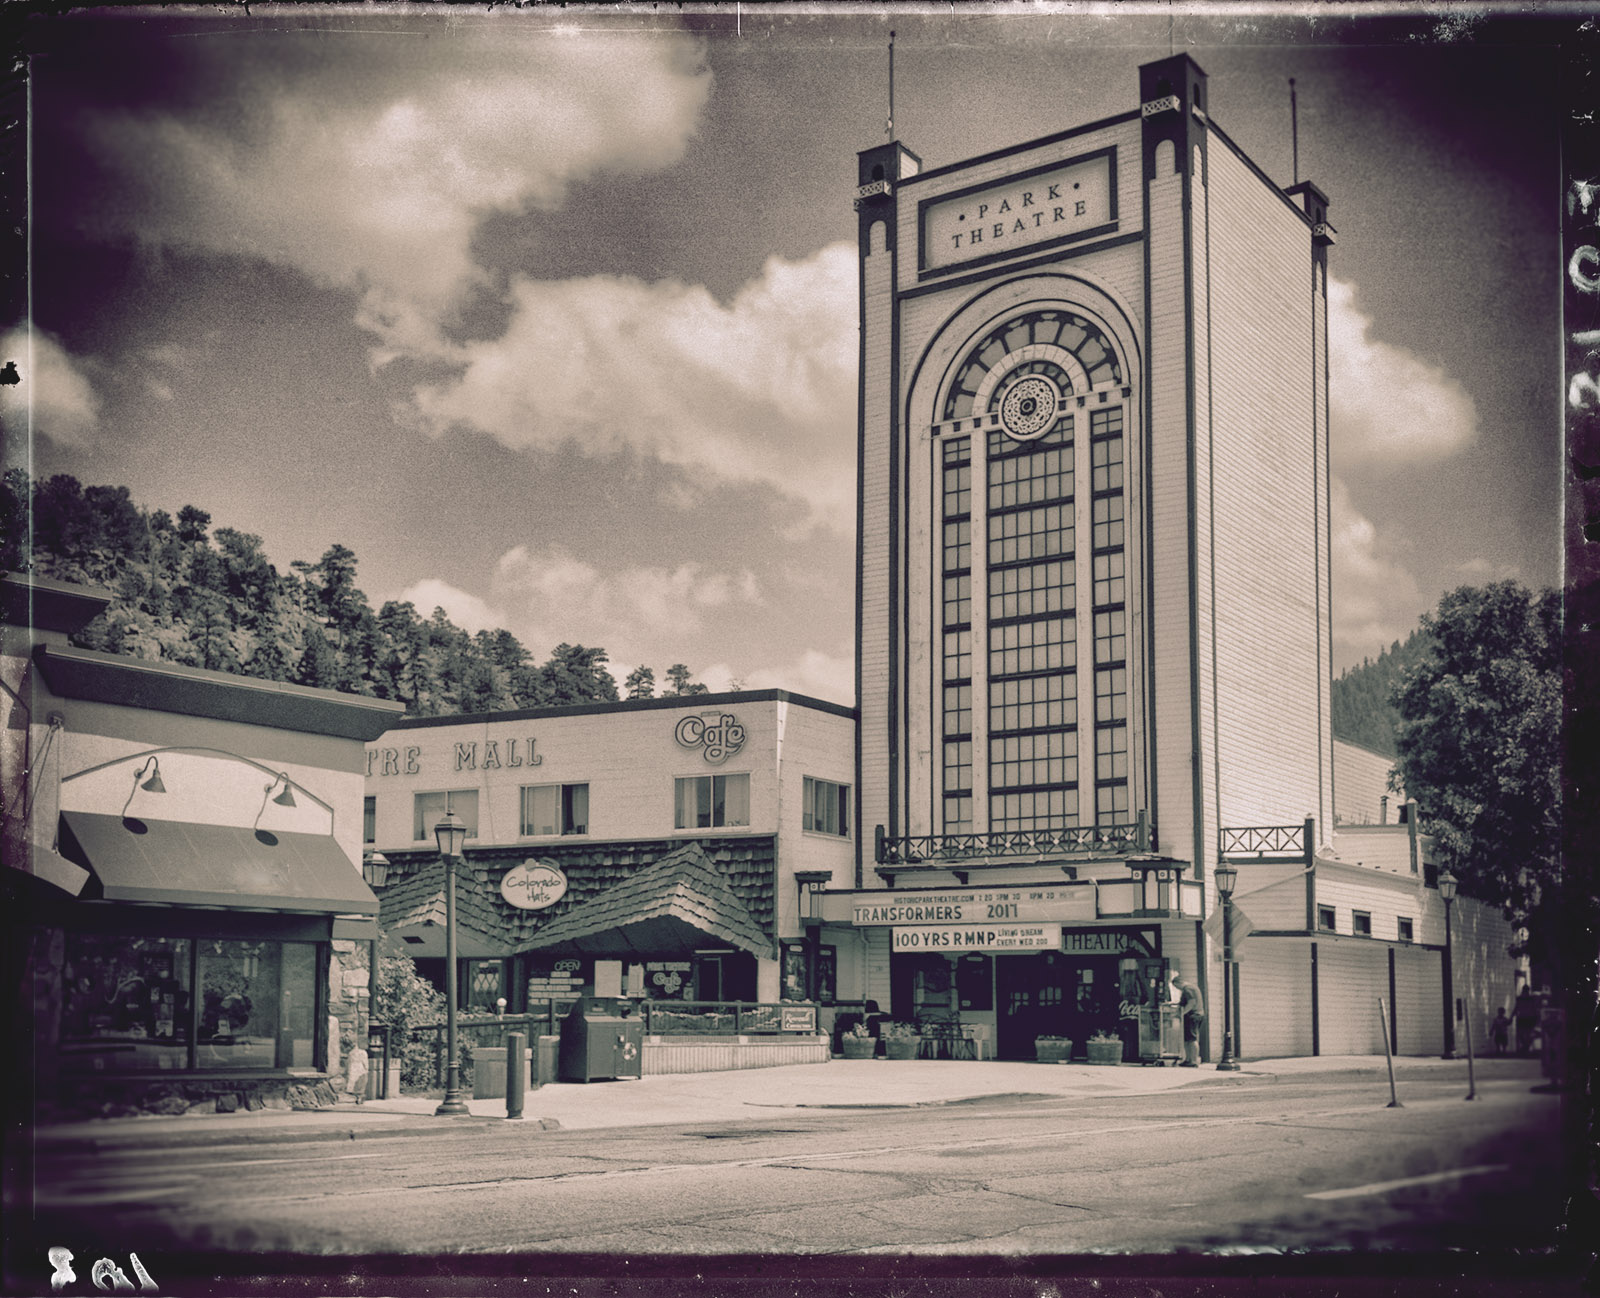 4x5 film, photo of Park Theatre in Estes Park, Colorado